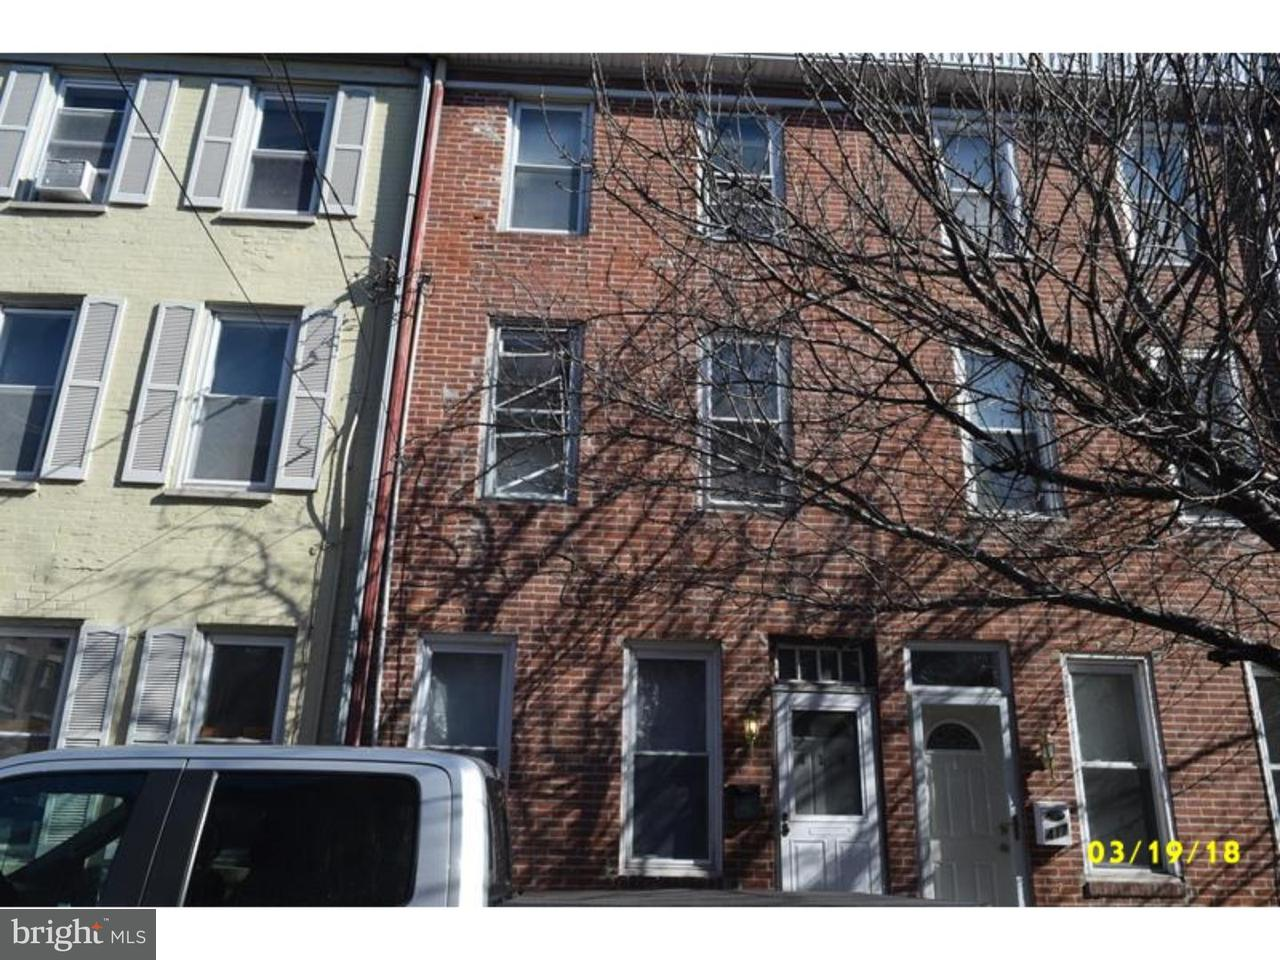 419 W George Street Philadelphia, PA 19123